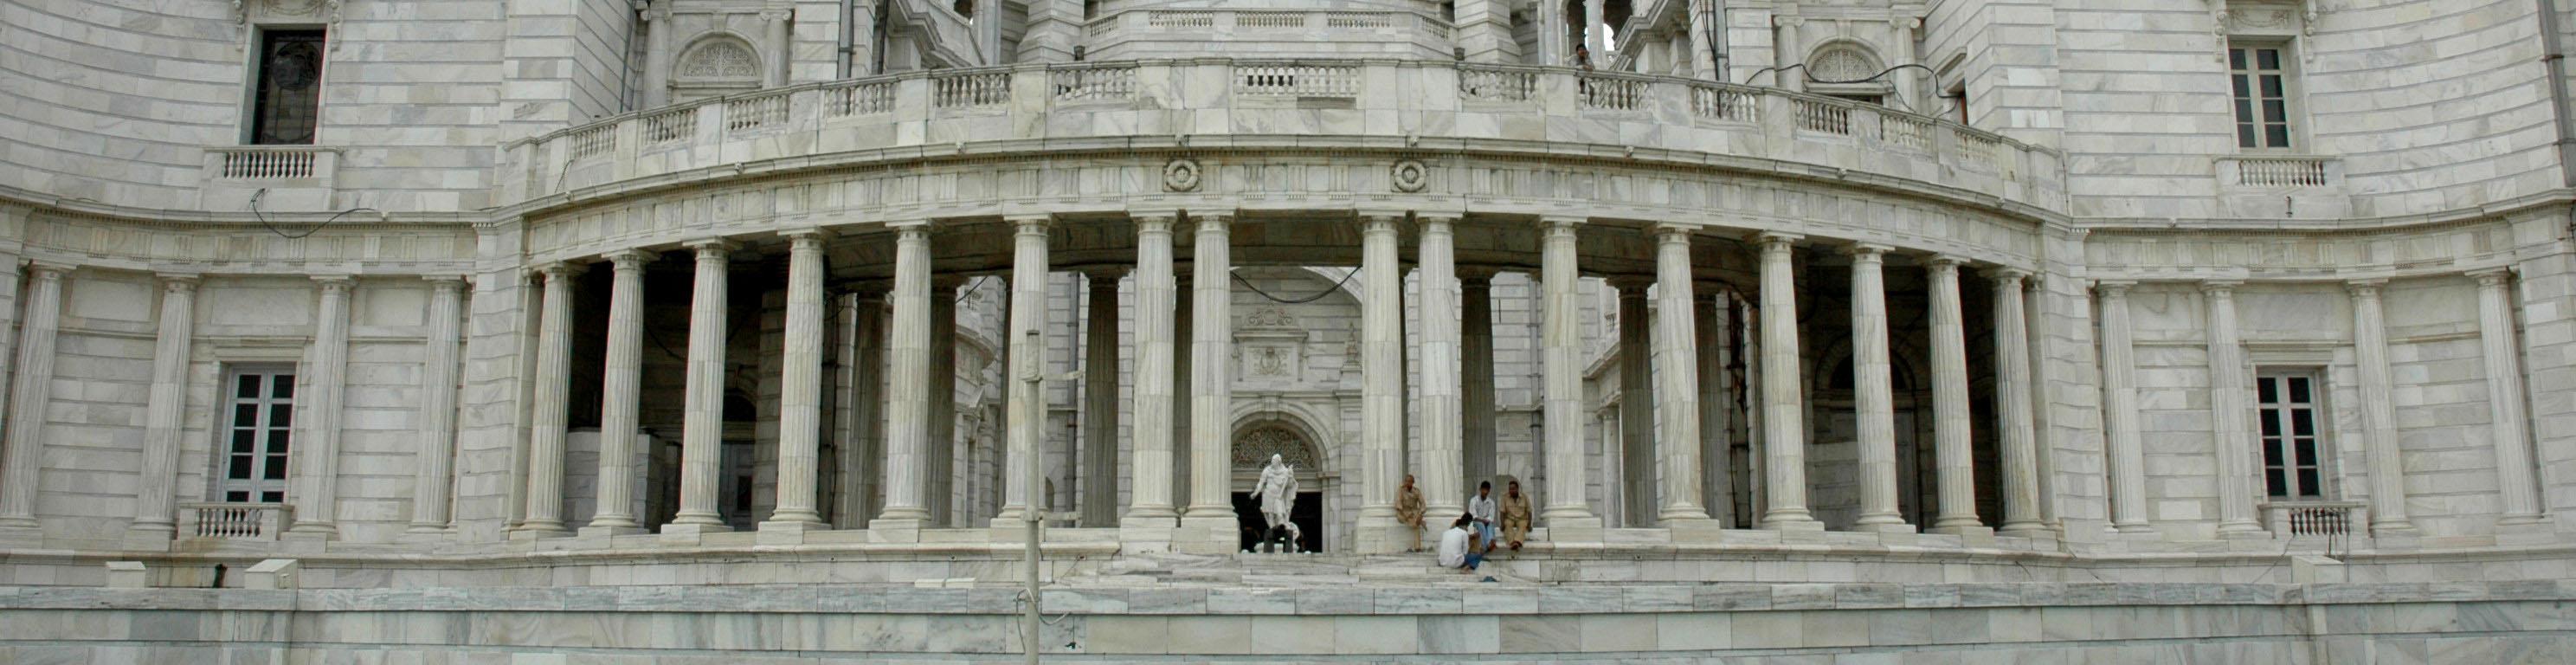 Victoria Memorial Kolkata Big Marble Building West Bengal India